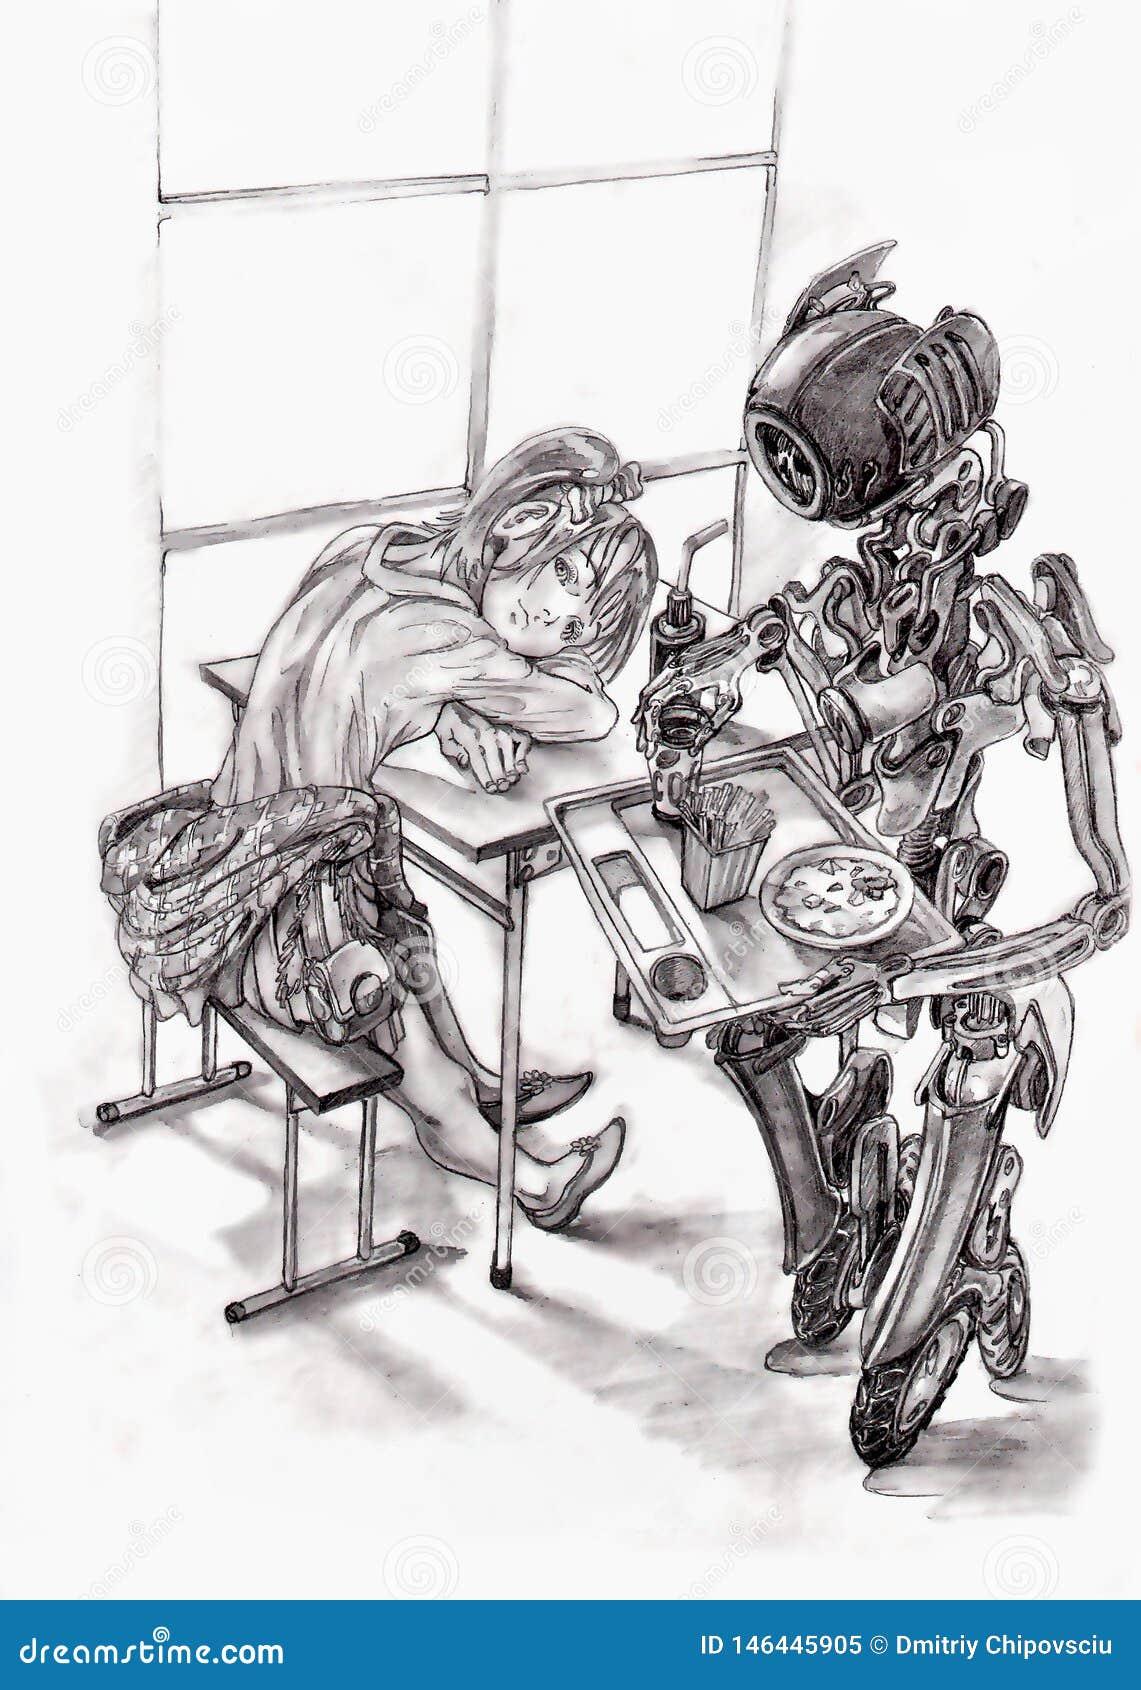 официант робота